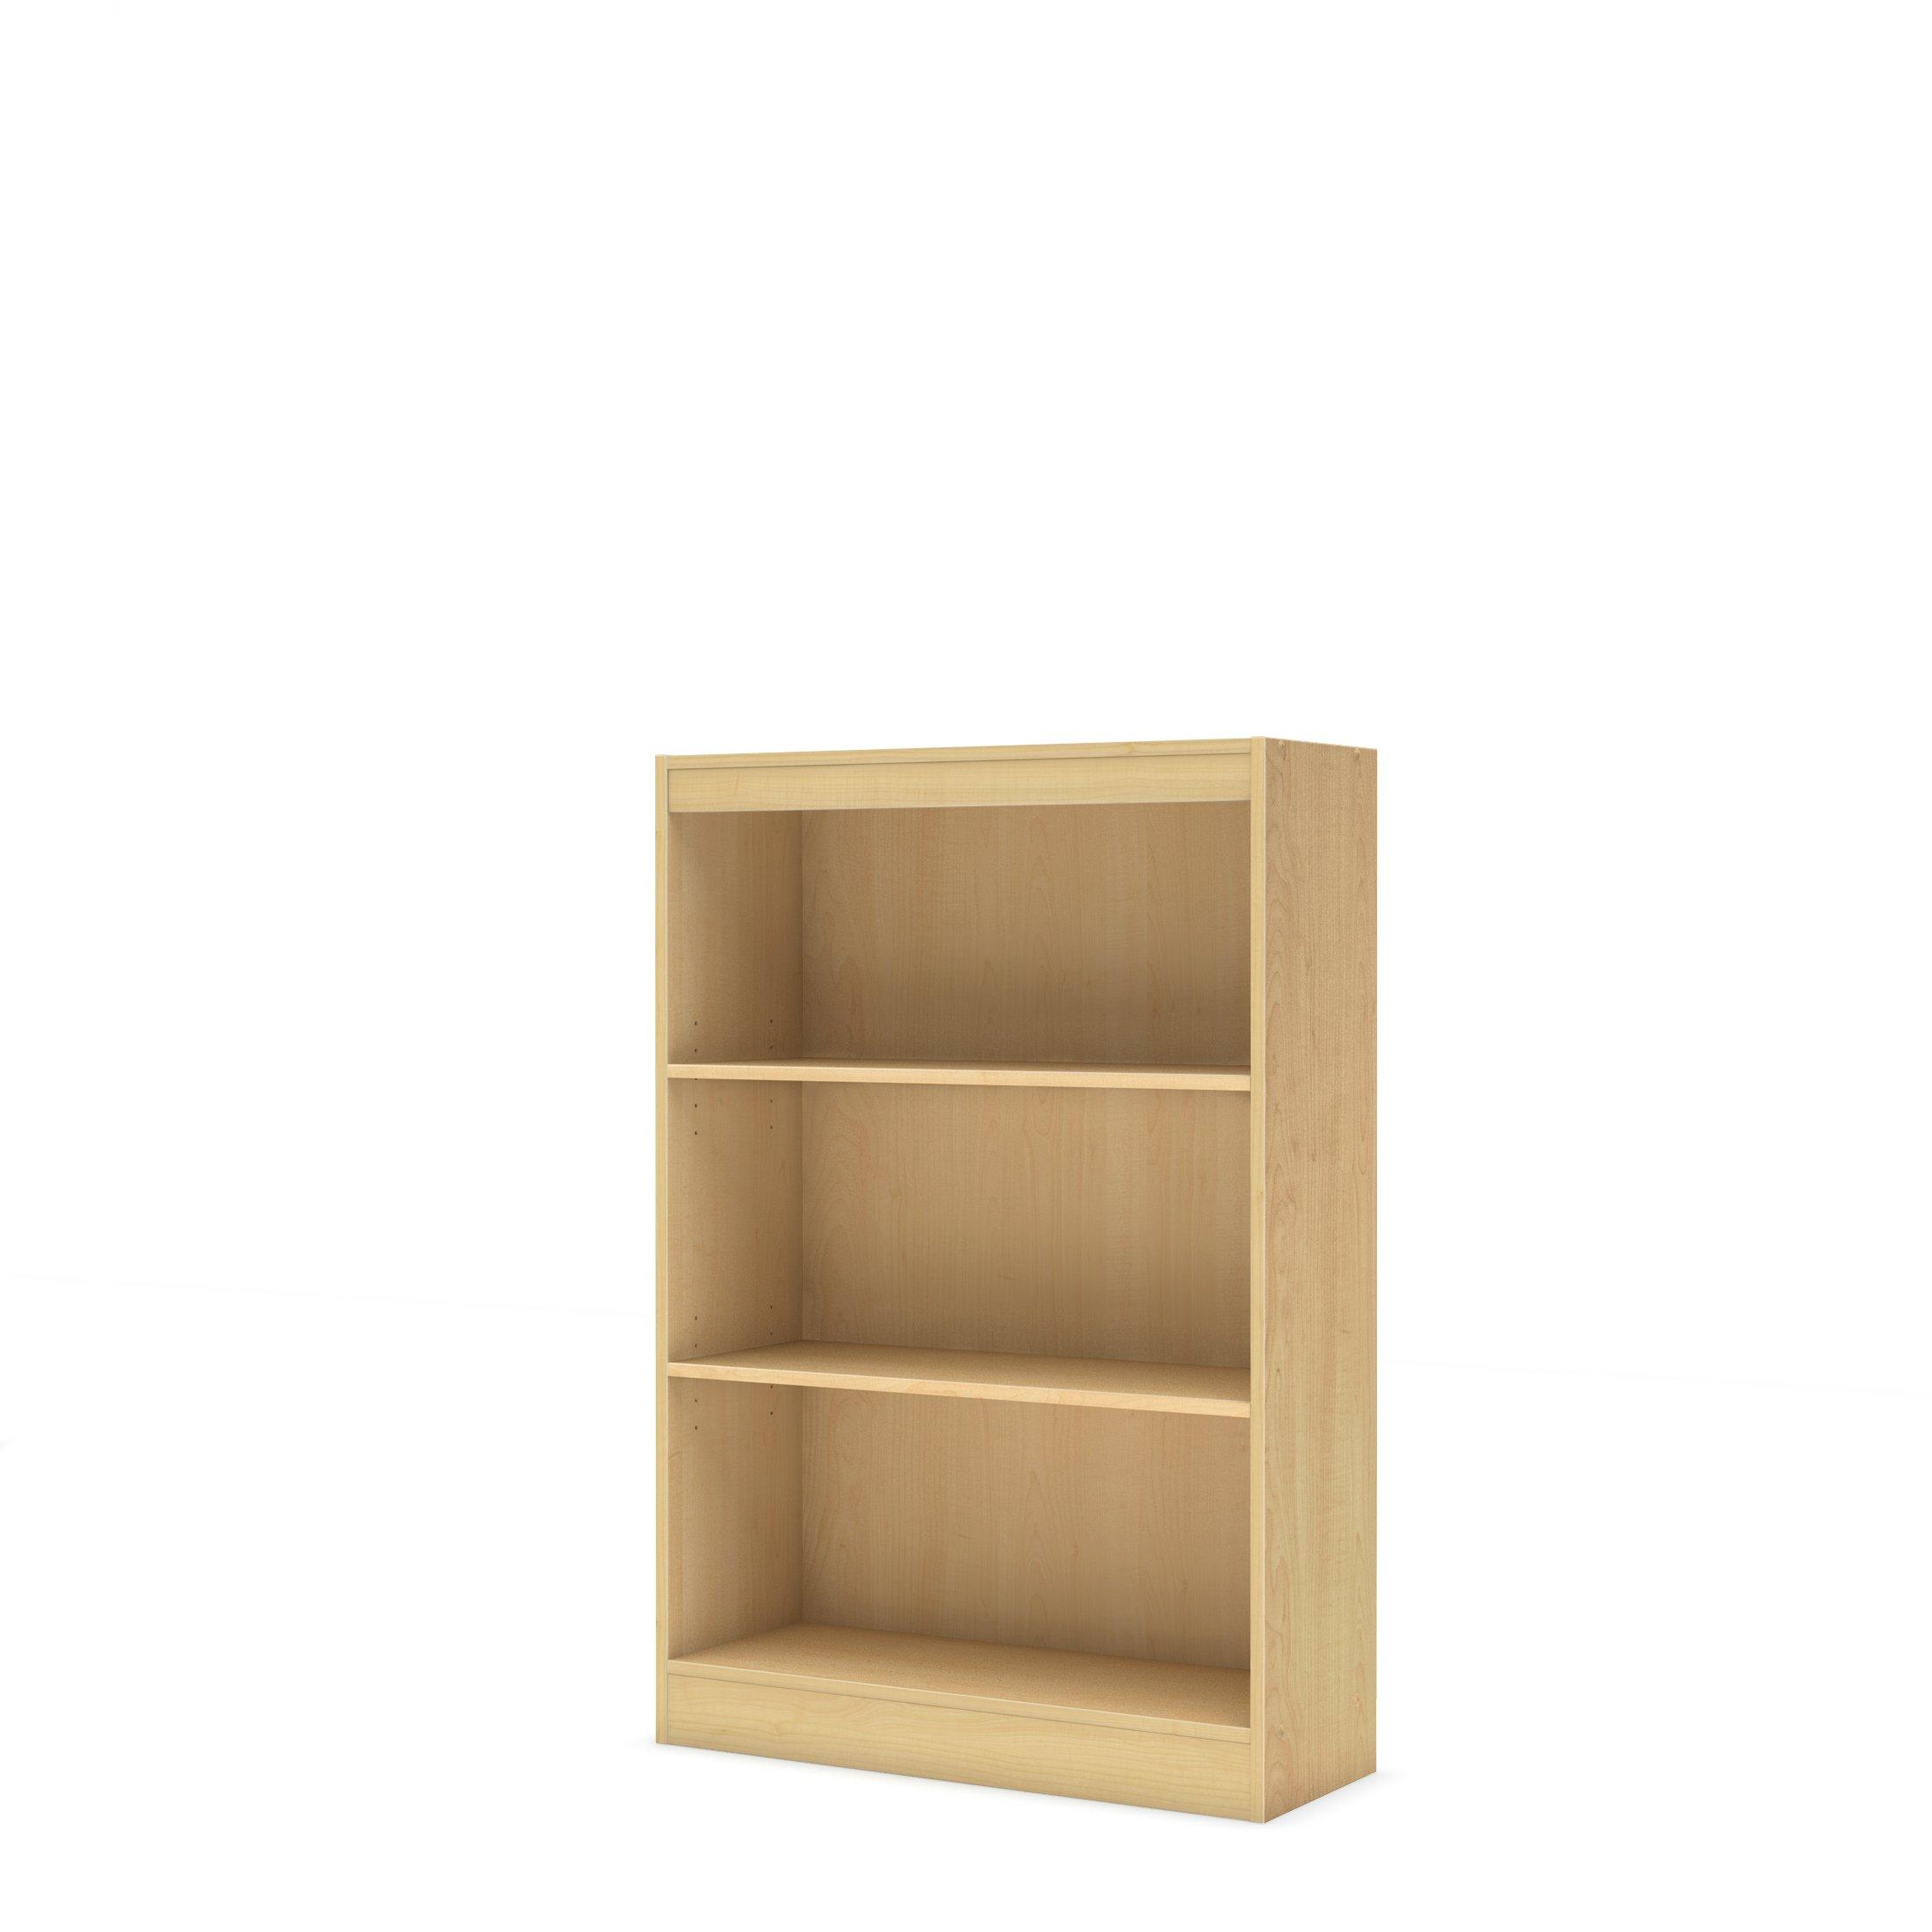 South Shore 3-Shelf Storage Bookcase, Natural Maple